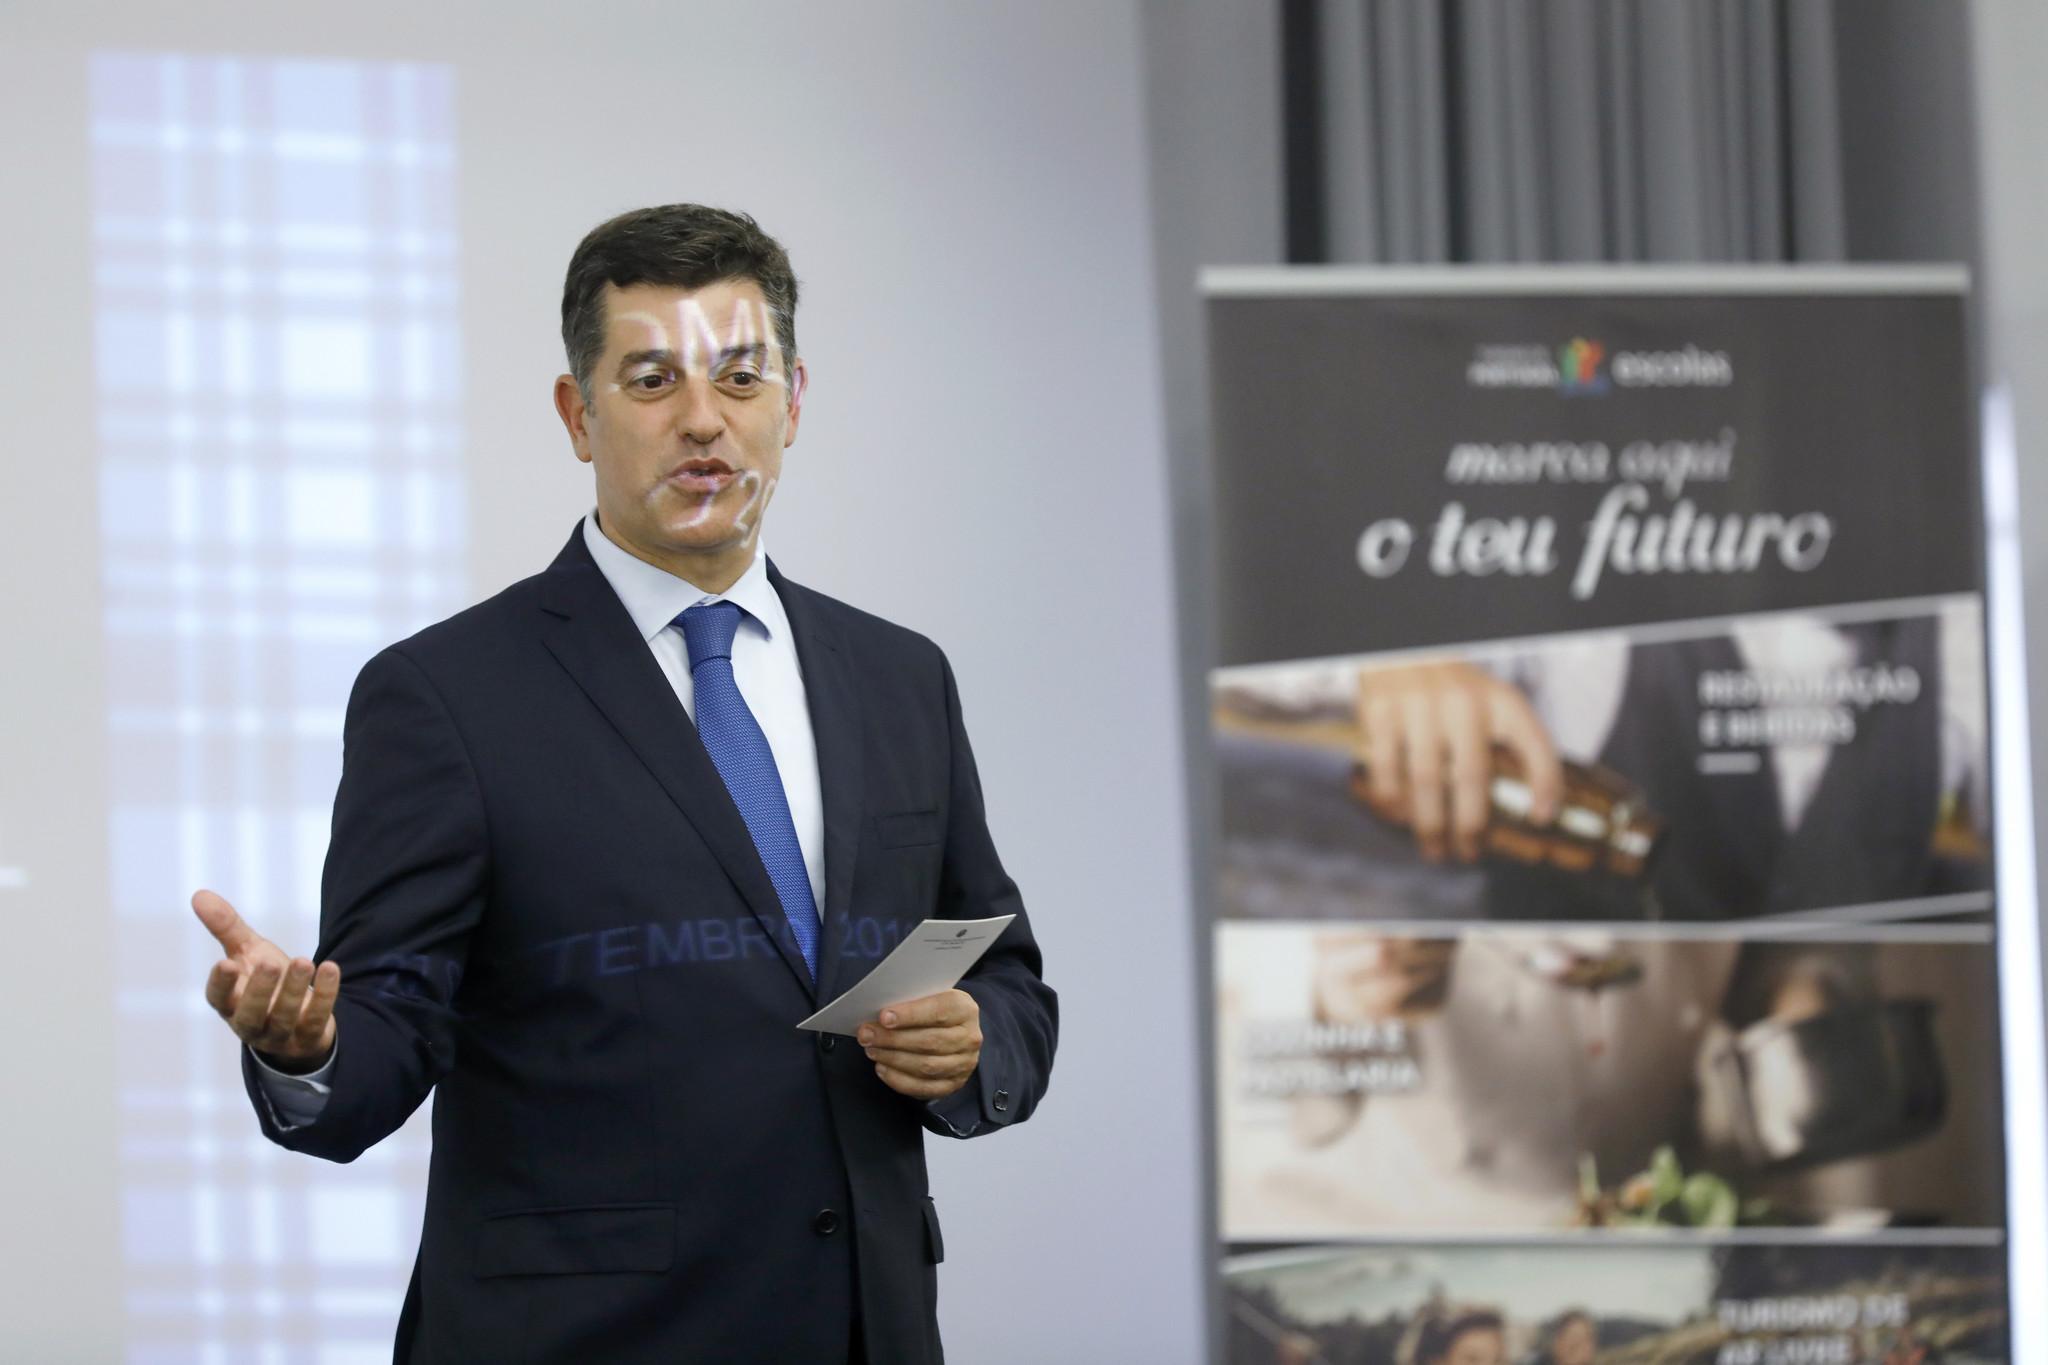 Manuel Caldeira Cabral Ministro Economia.JPG